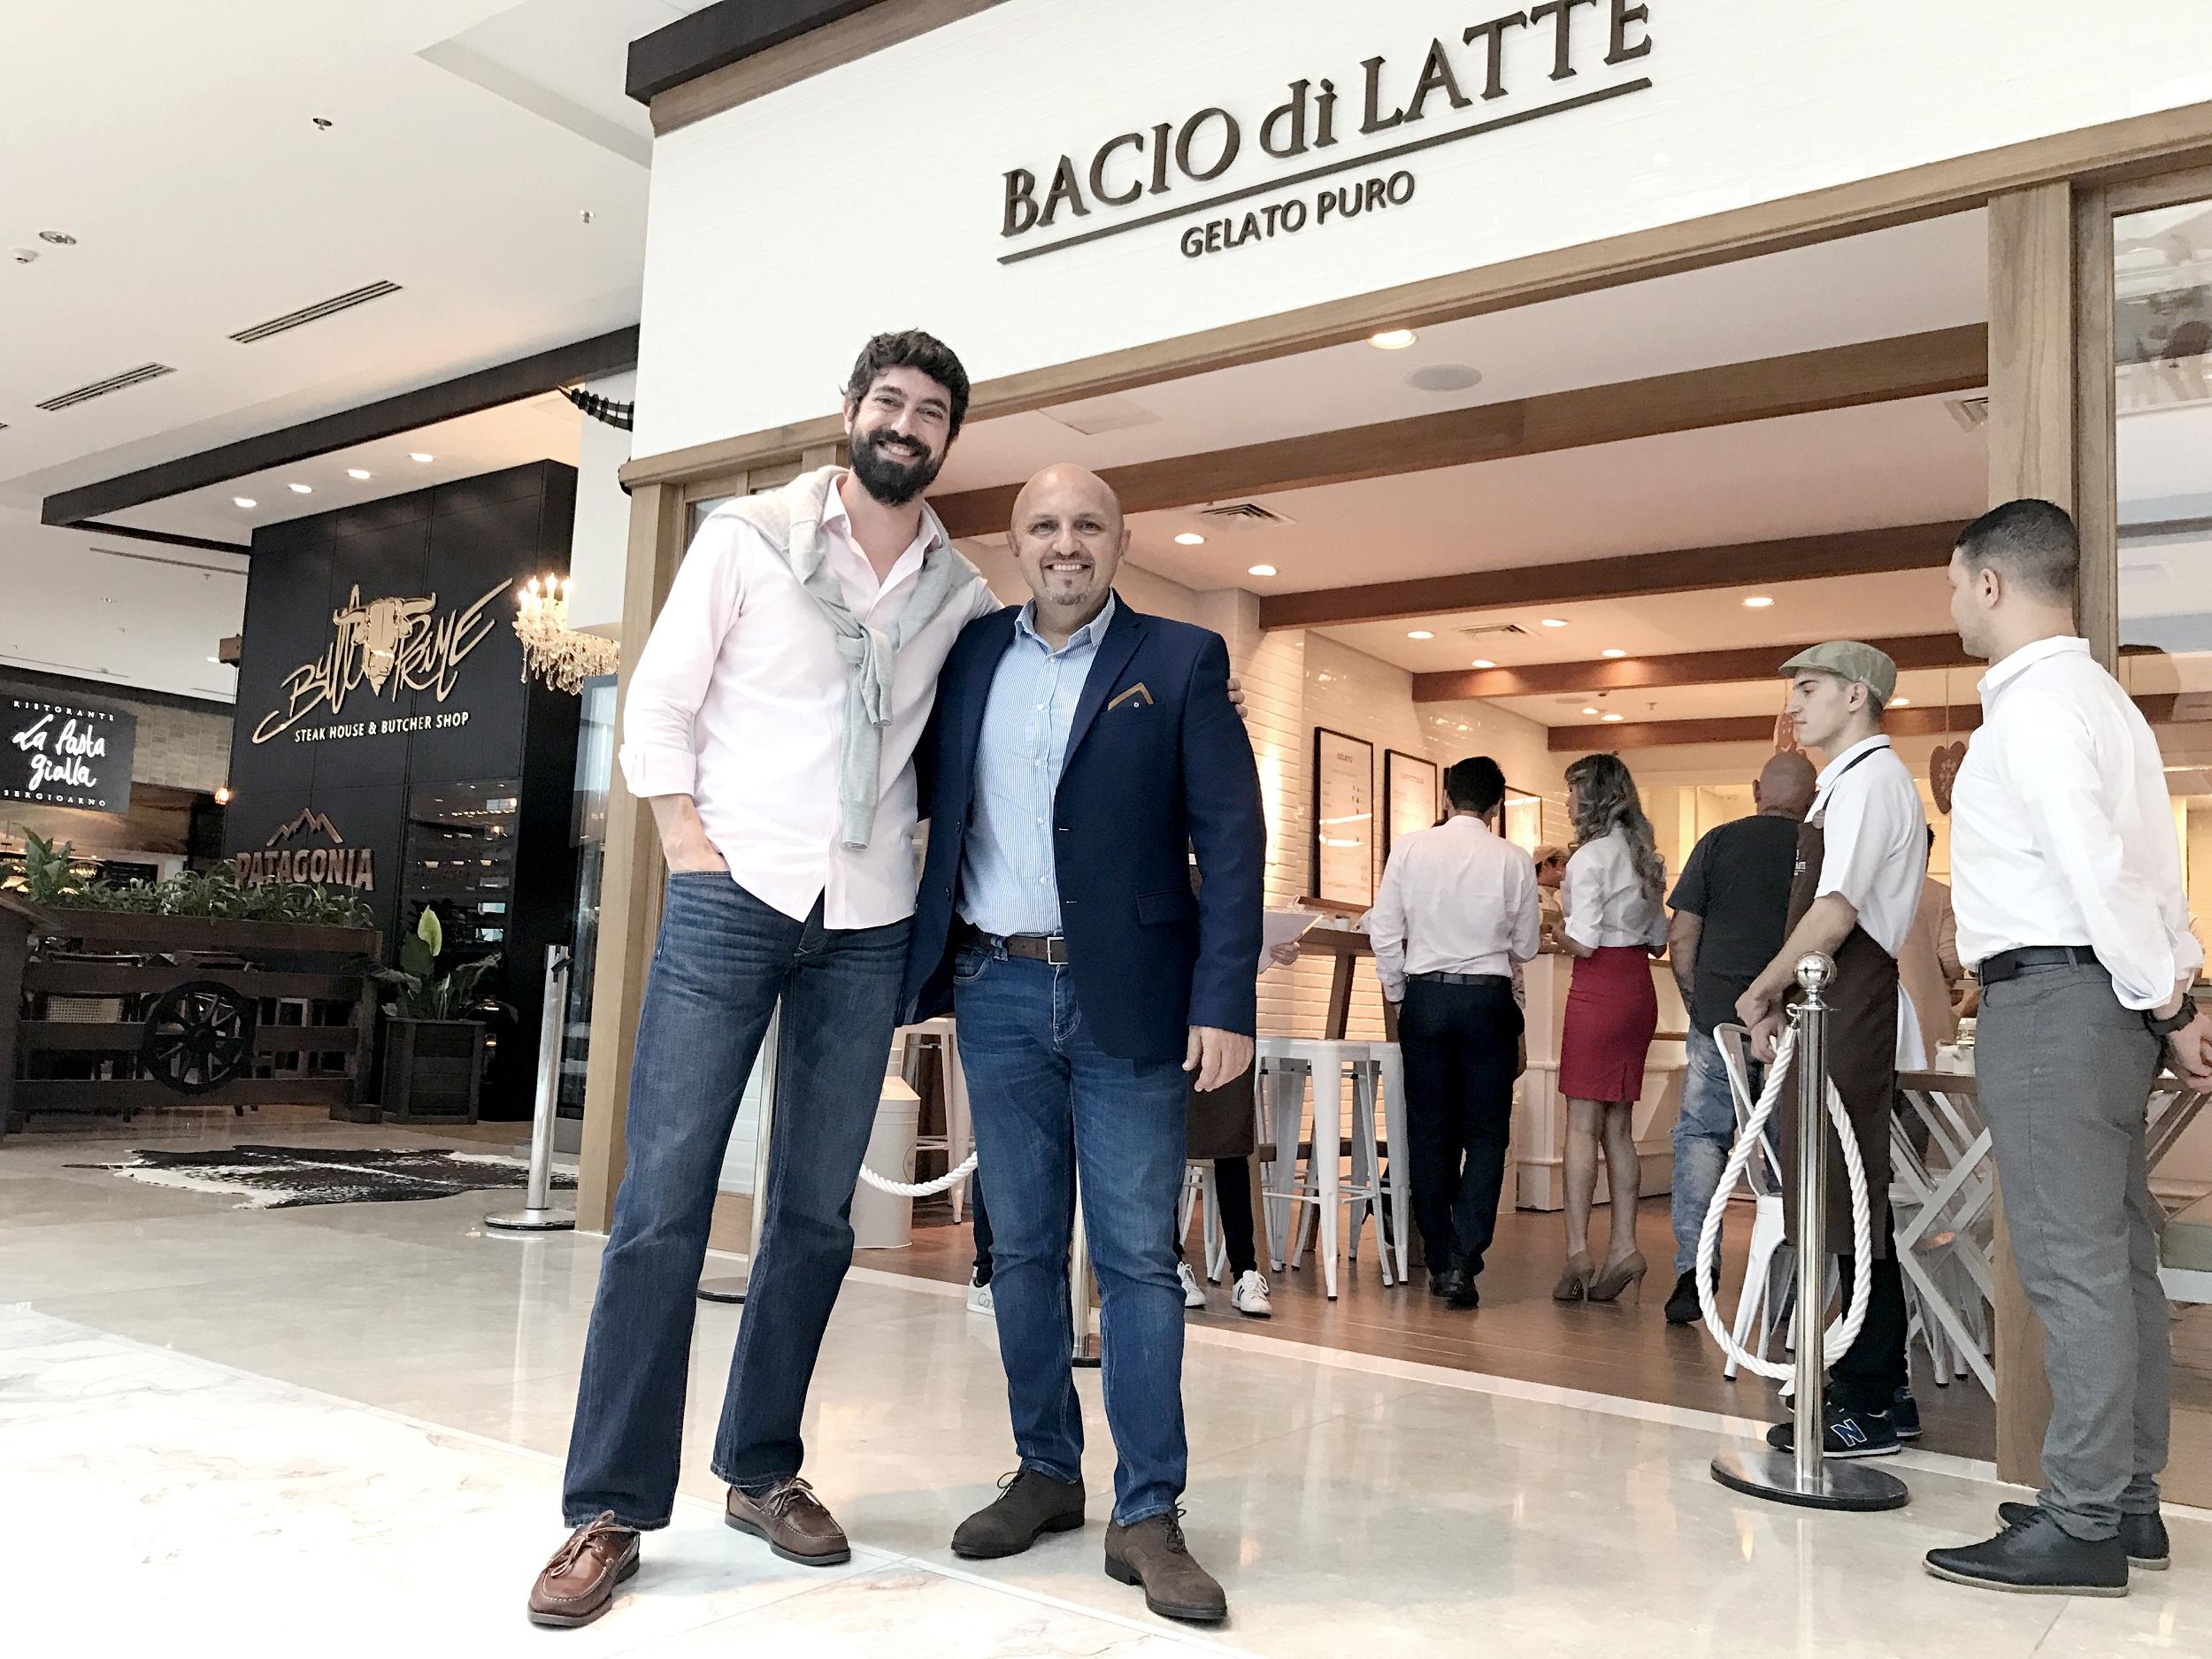 Marca italiana de gelatos premium abre loja em Curitiba